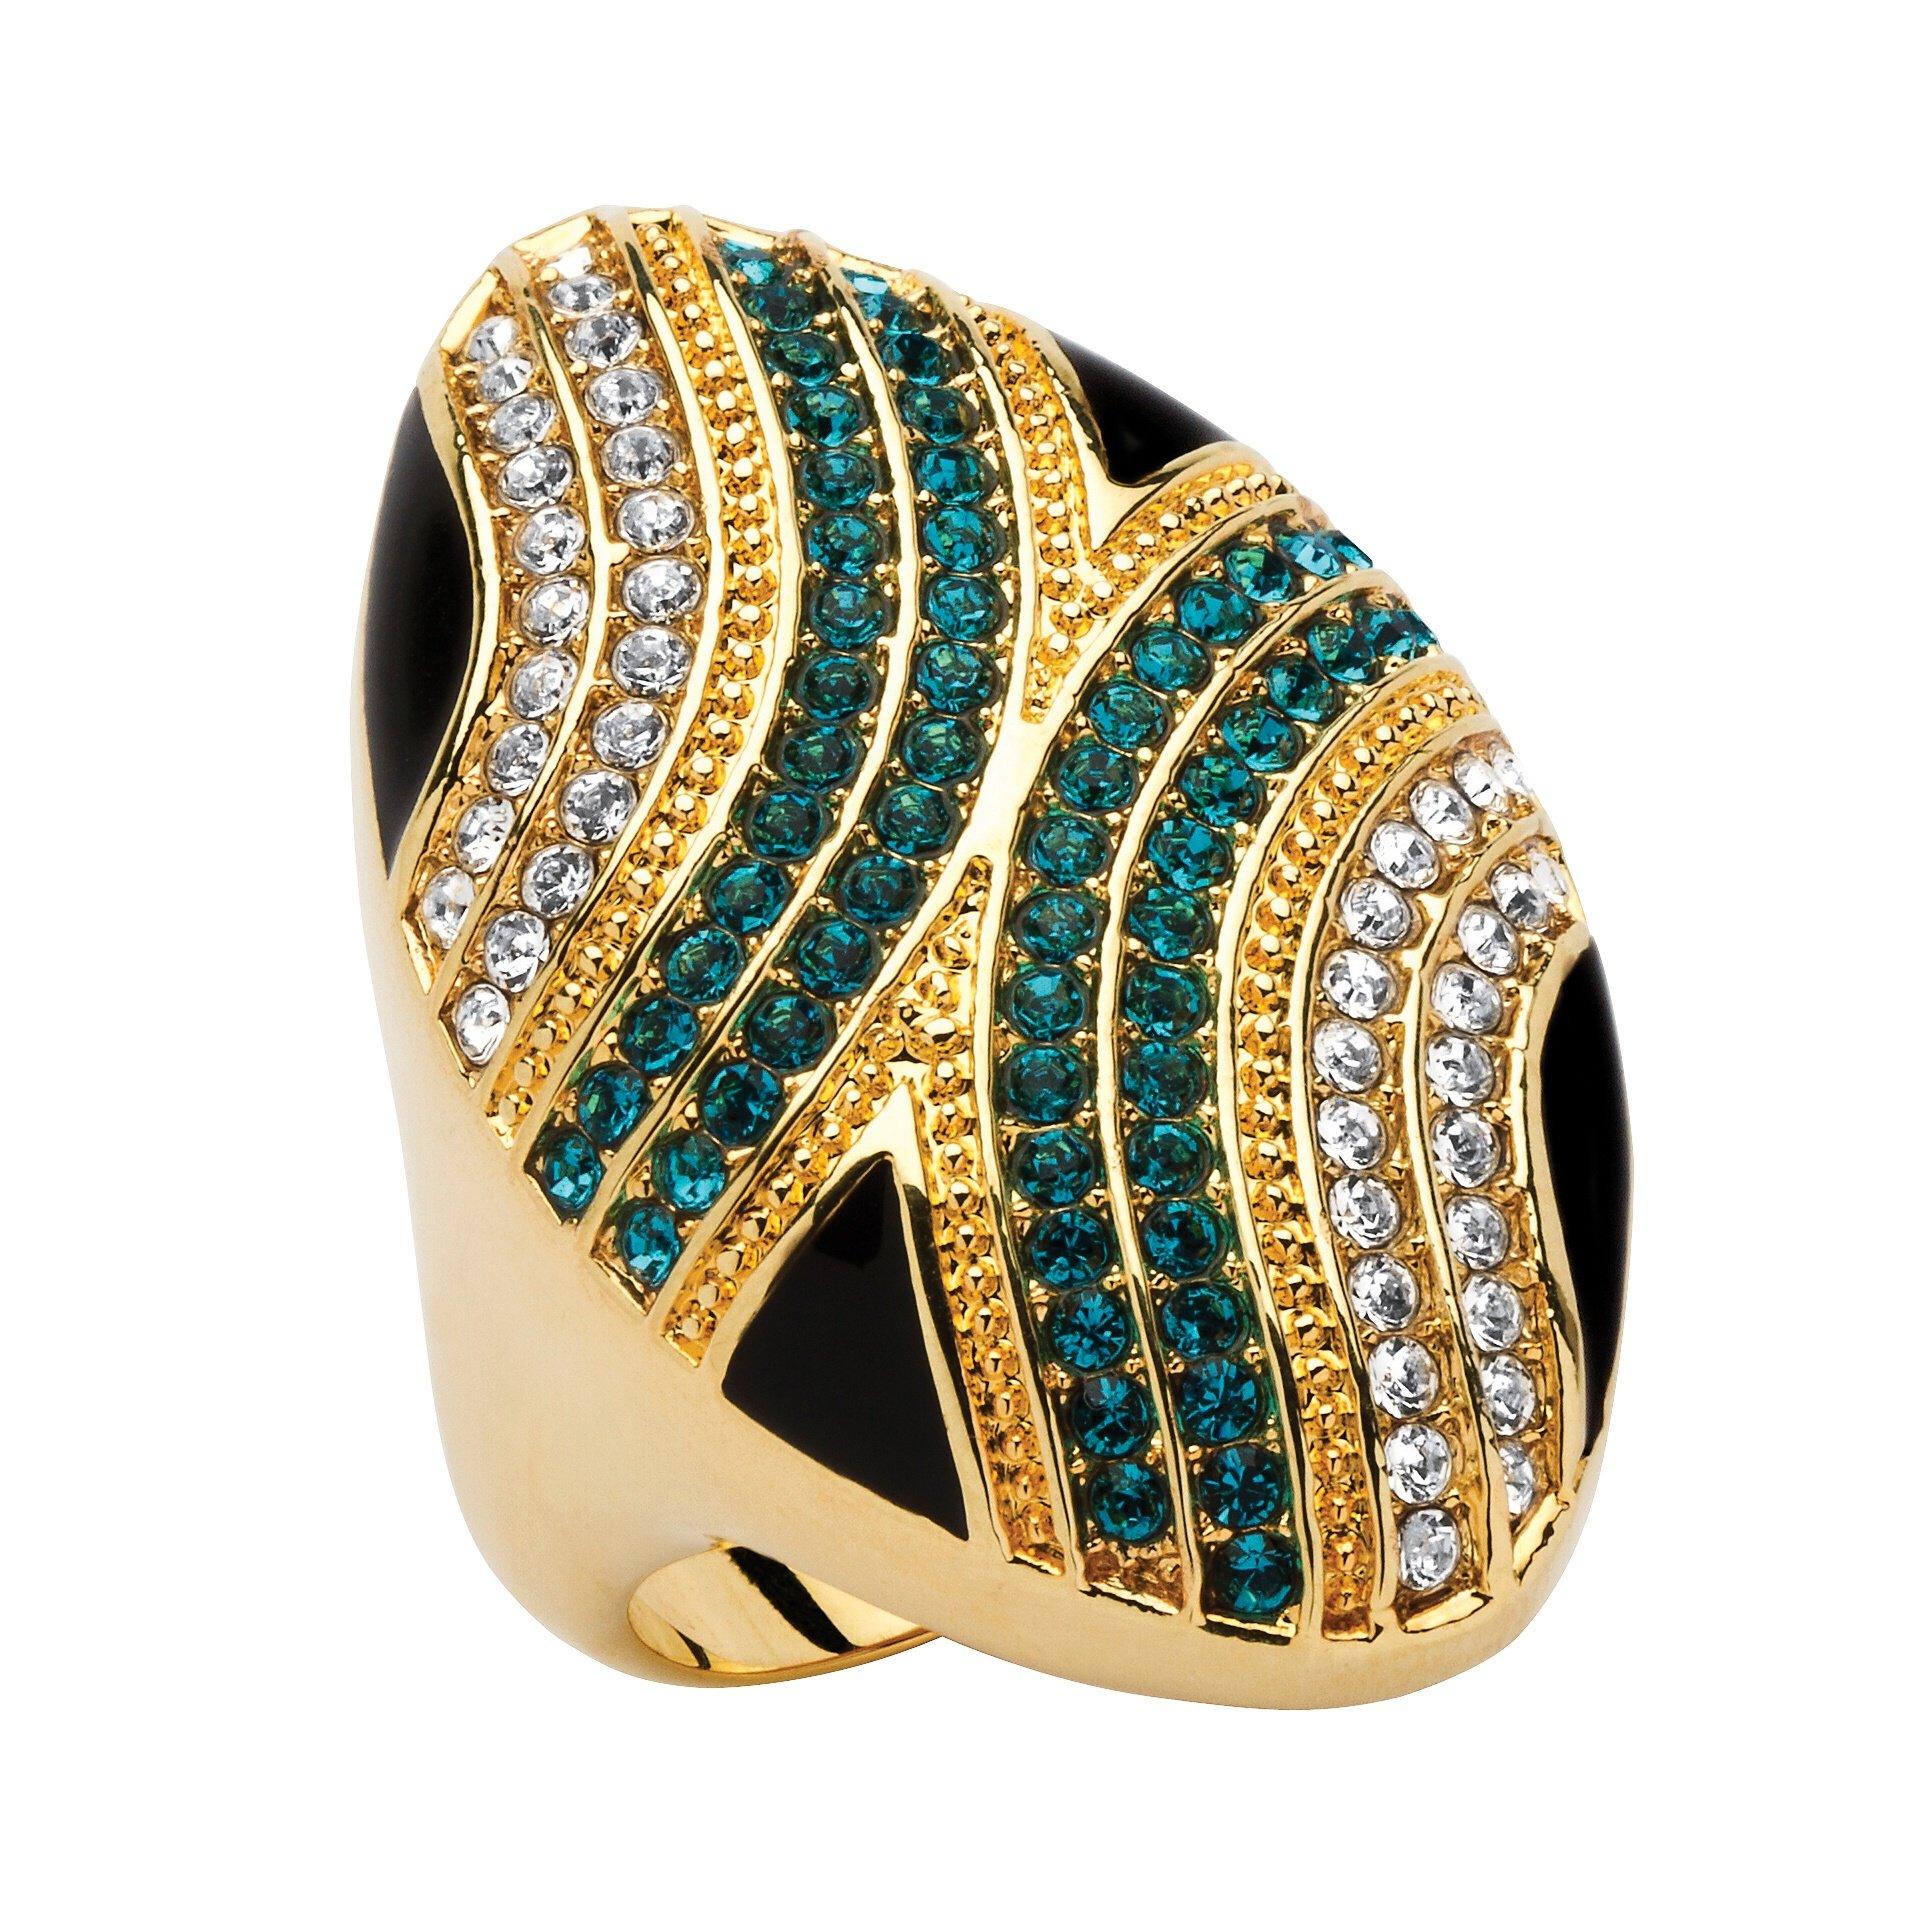 Palm Beach Jewelry 14K Gold-Plated Blue White Black Enamel Ring Made Swarovski Elements Size 6